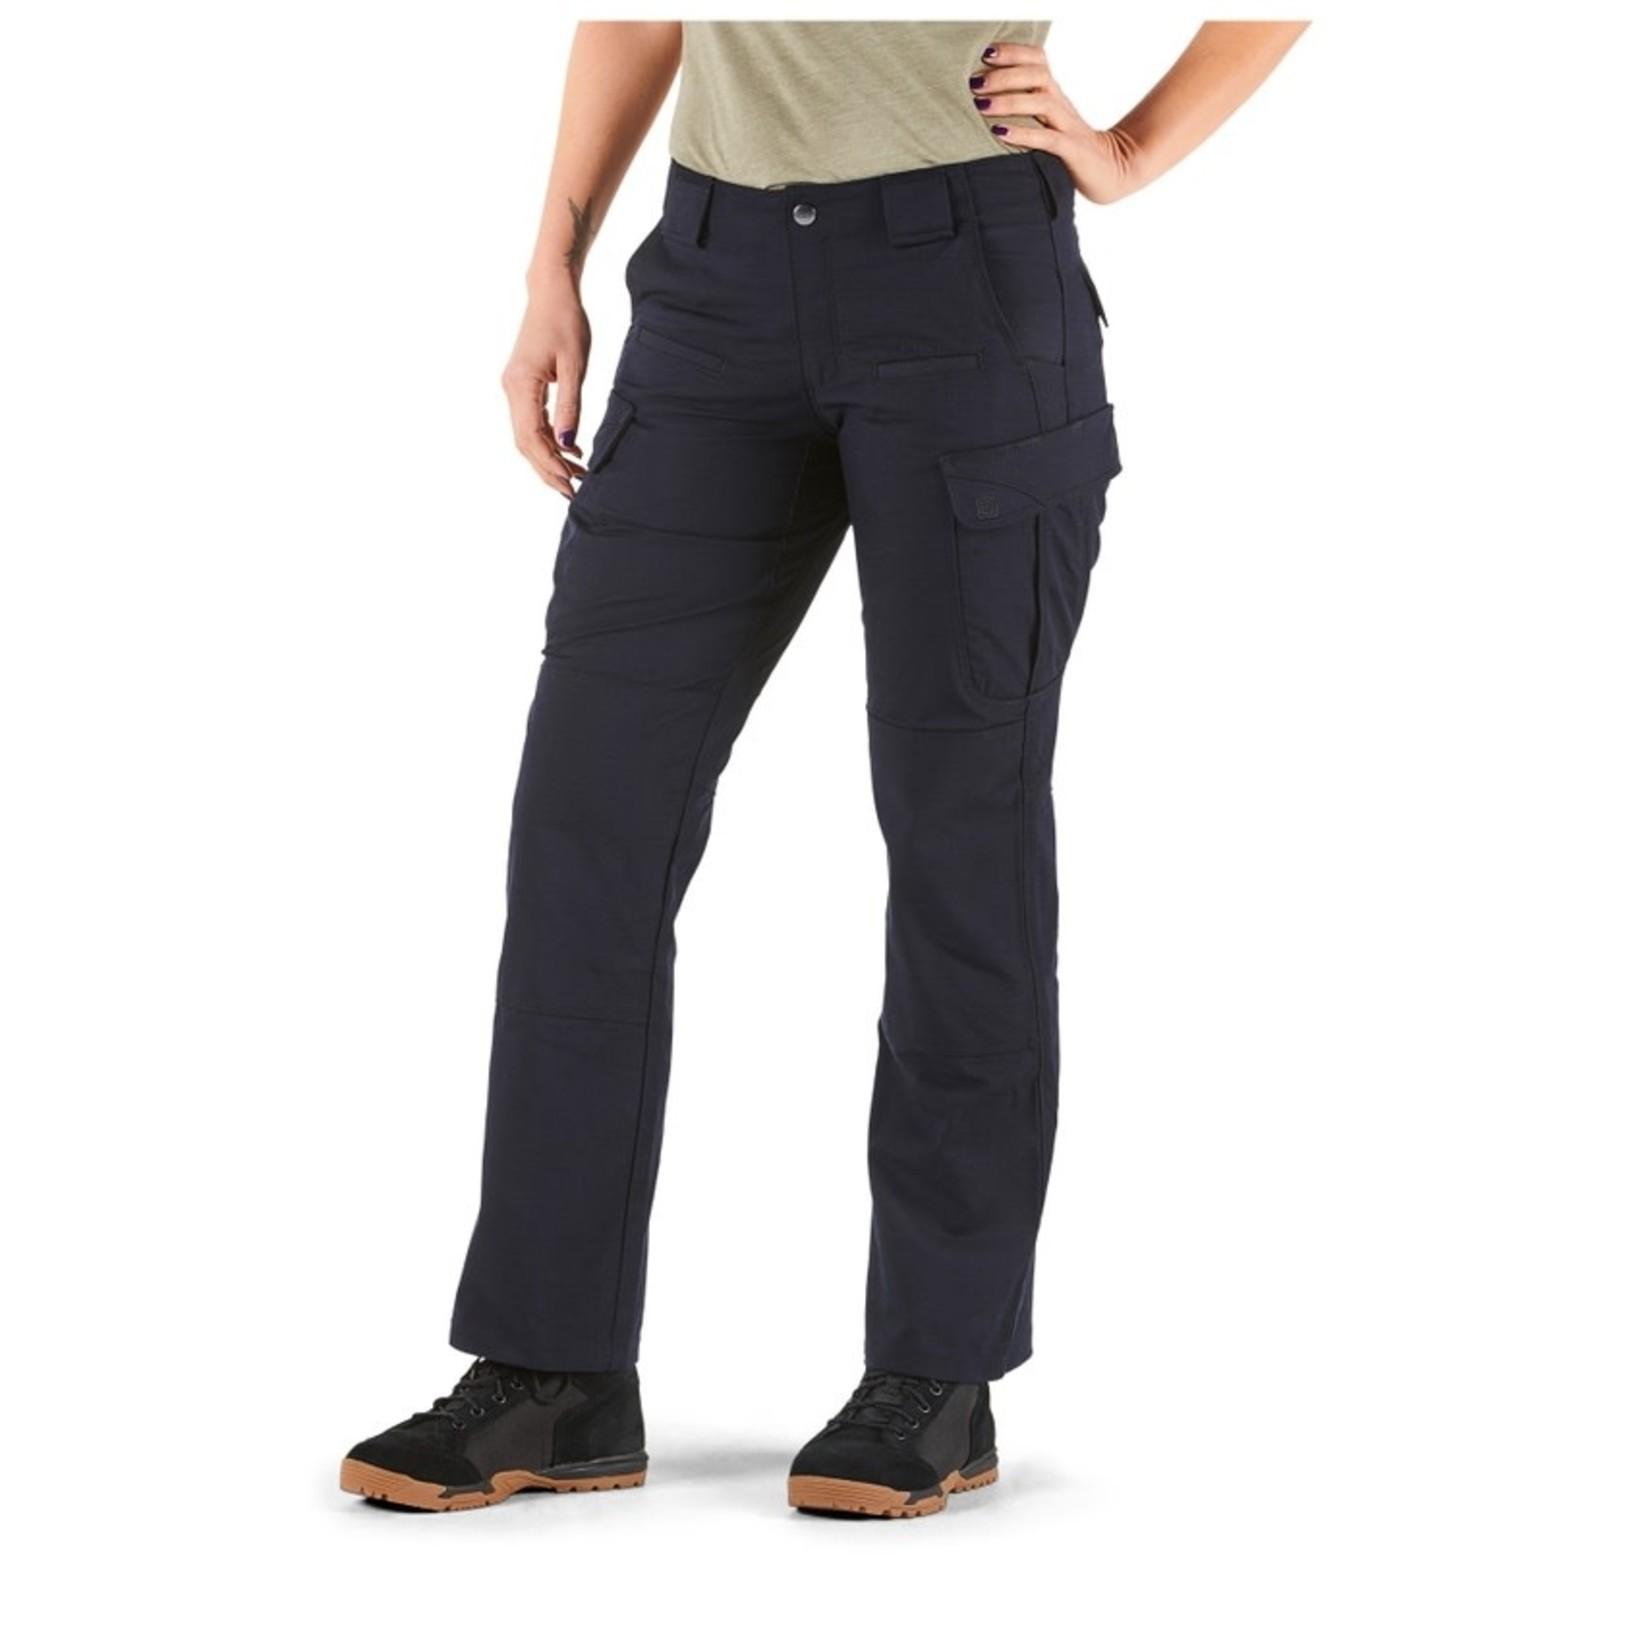 5.11 Tactical 5.11 Women's Stryke Pants